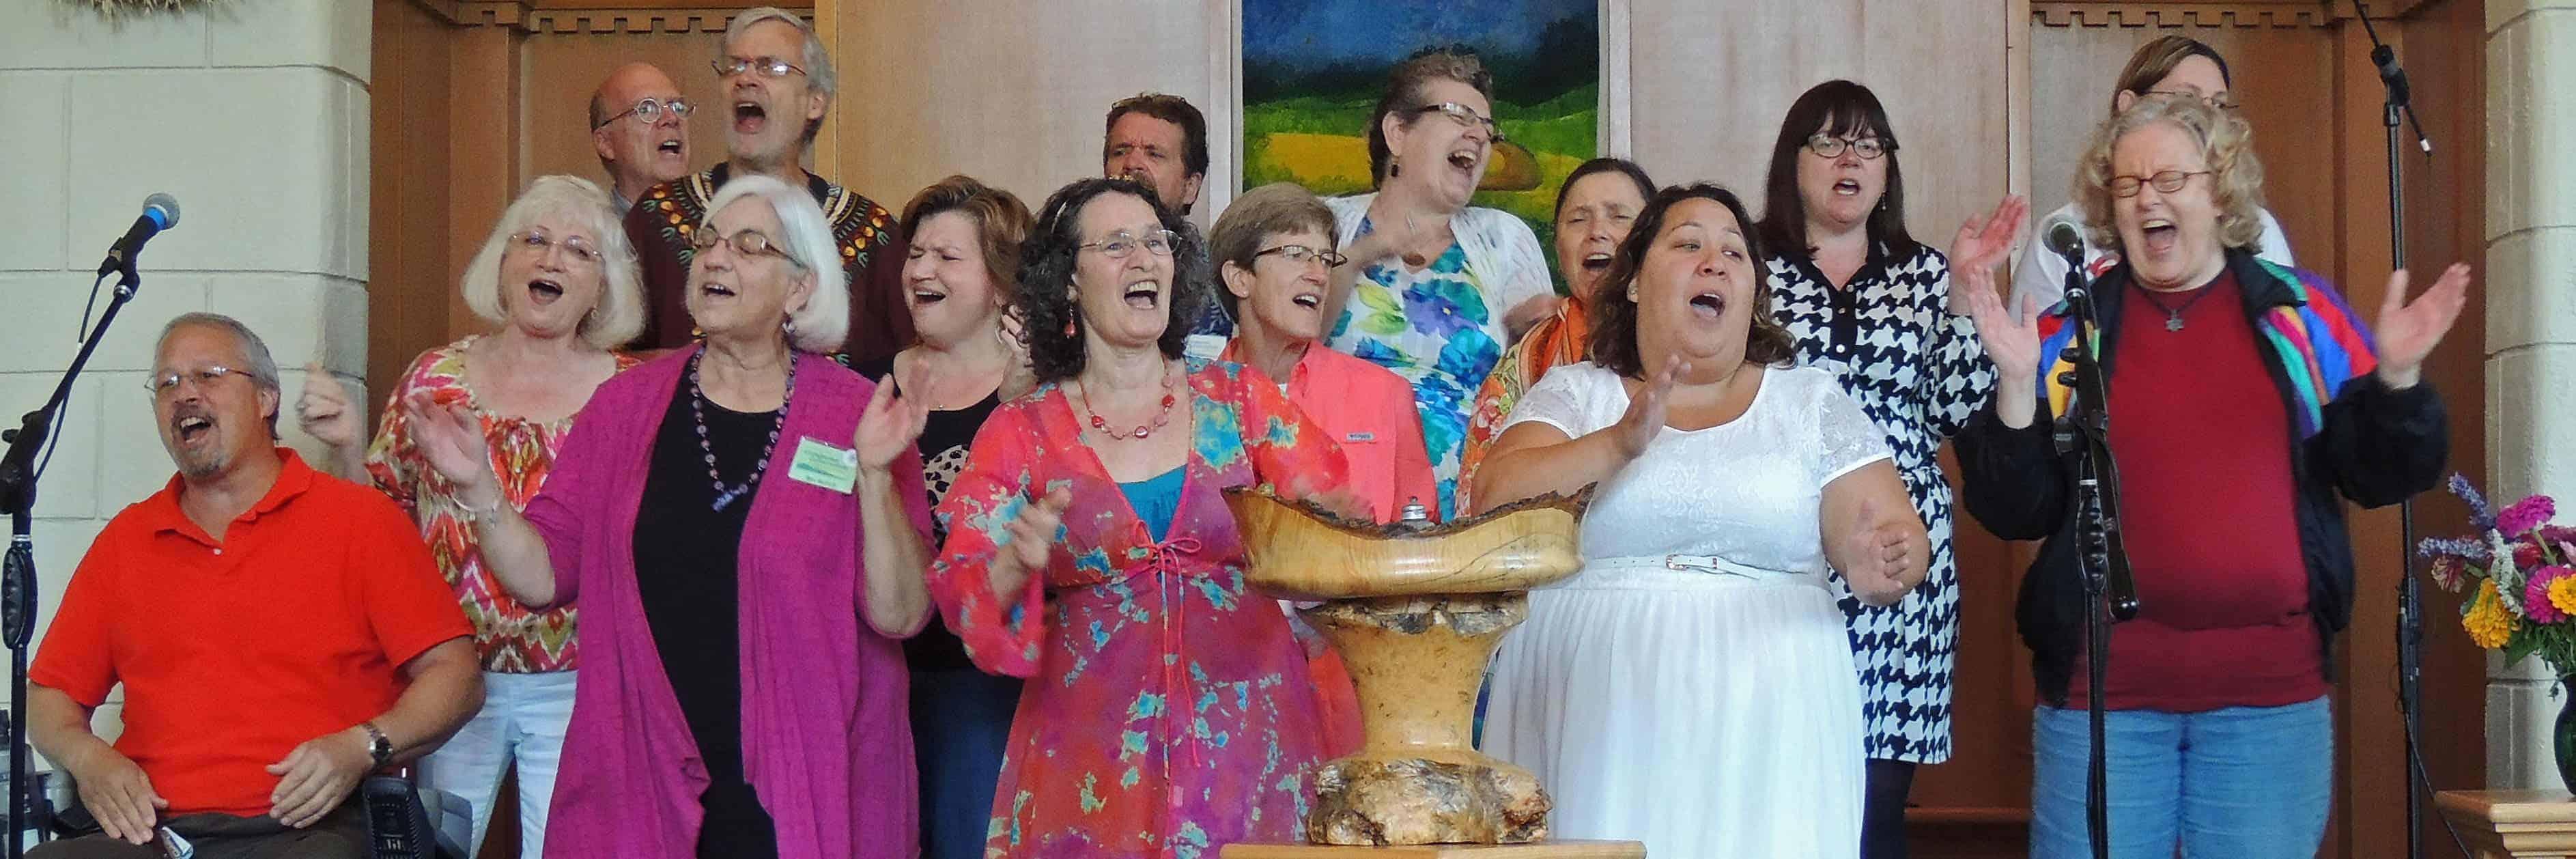 Photo of the UUCV choir singing enthusiastically